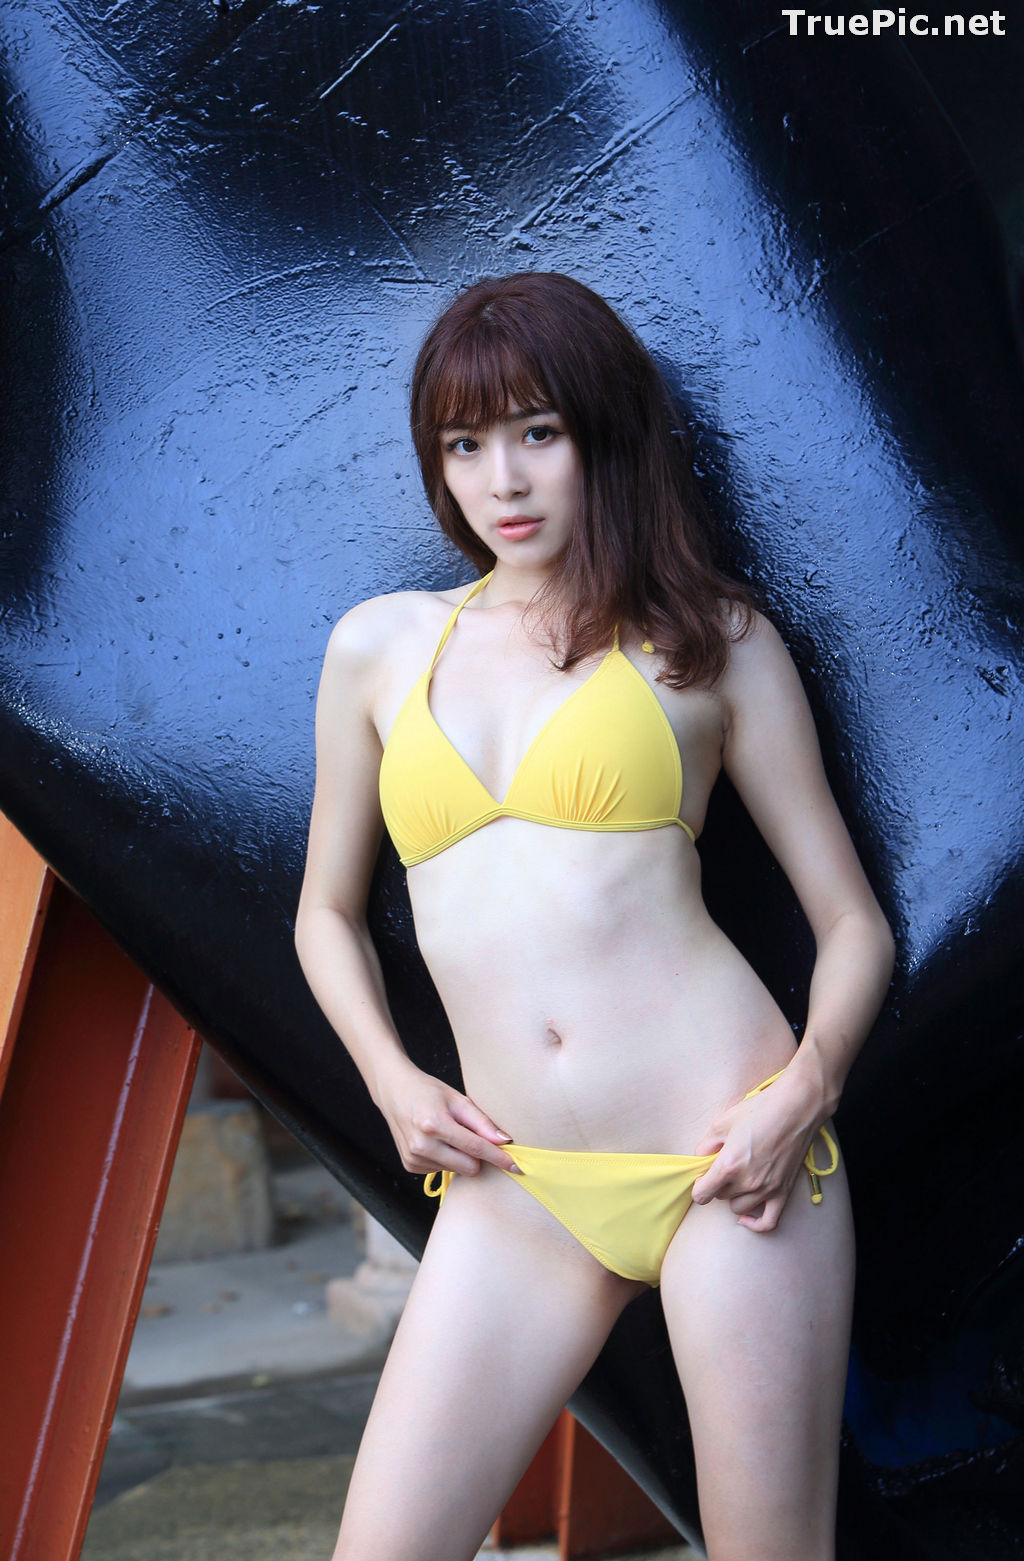 Image Taiwanese Model - Ash Ley - Yellow Bikini at Taipei Water Museum - TruePic.net - Picture-78